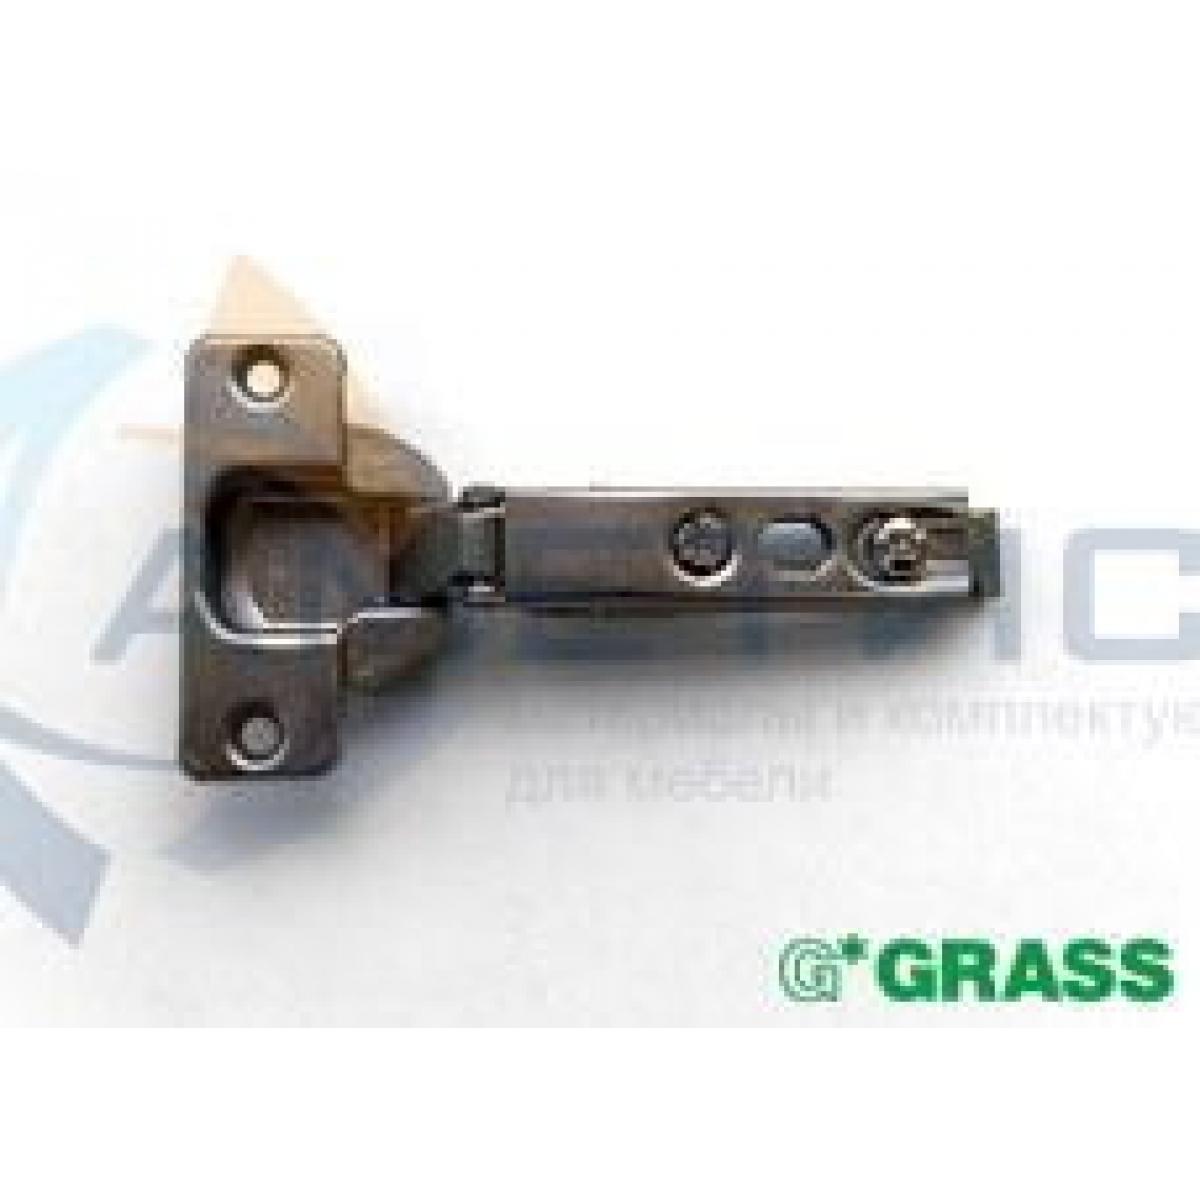 Петля Grass Slide-On для вкладных дверей, угол открывания 100 гр.(F016073018236)